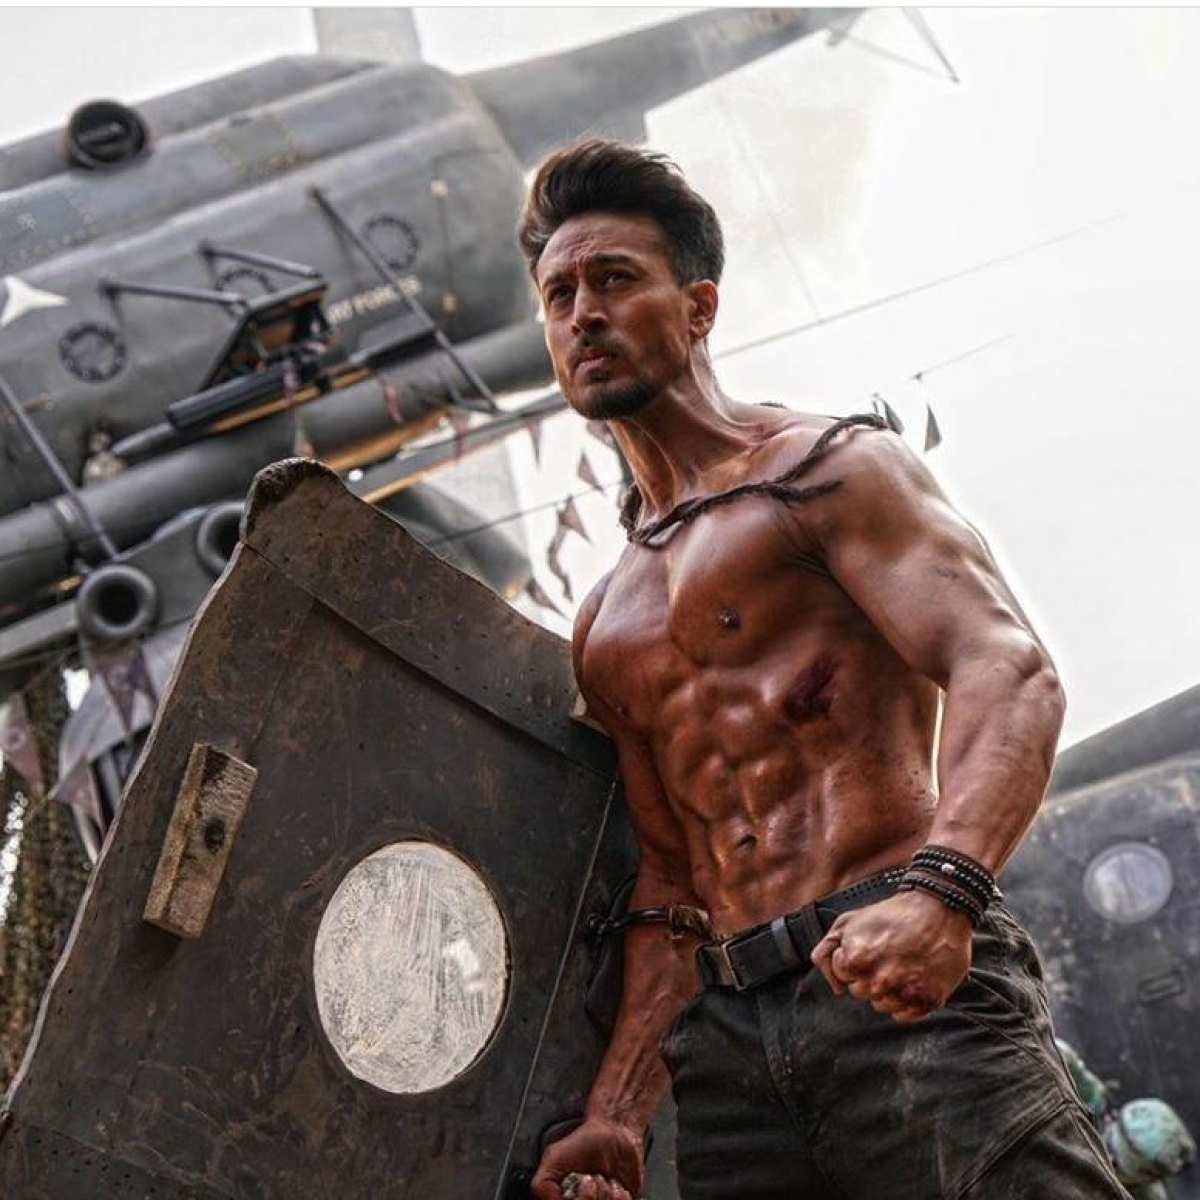 Movie Review: Baaghi 3 - Same ol' Tiger Shroff thing